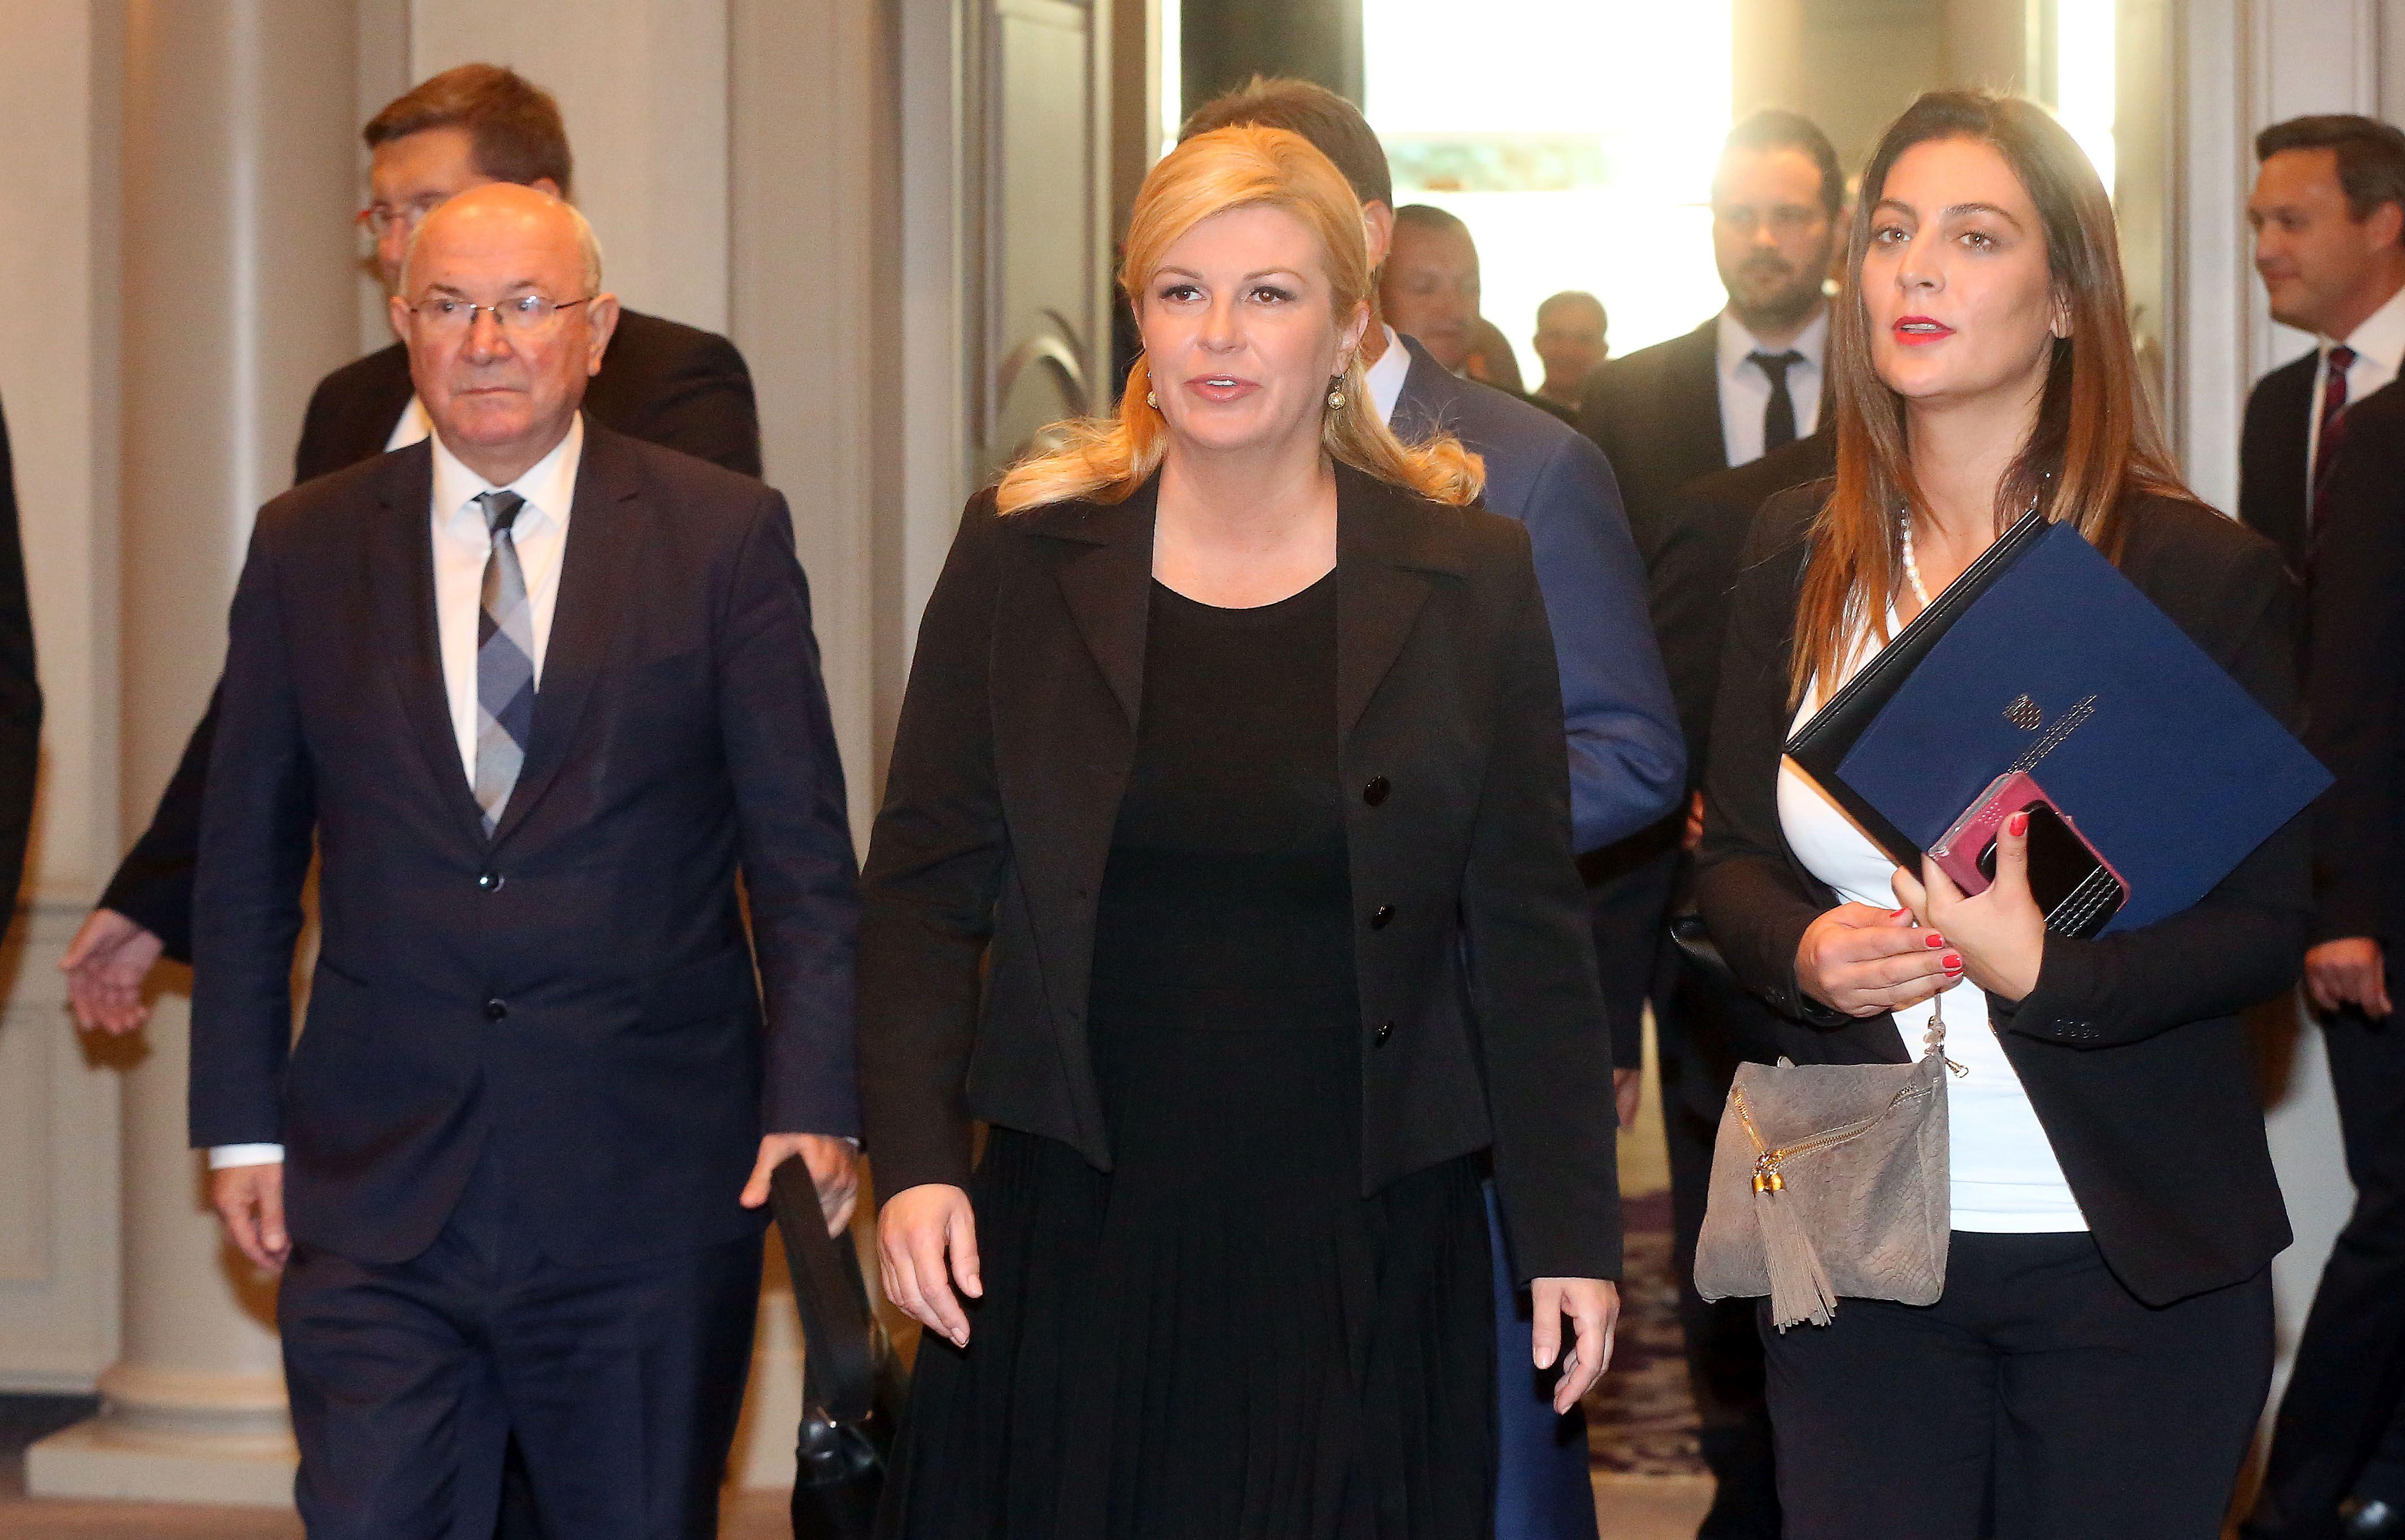 GRABAR-KITAROVIĆ 'Nužno je reformirati diplomatsku mrežu'